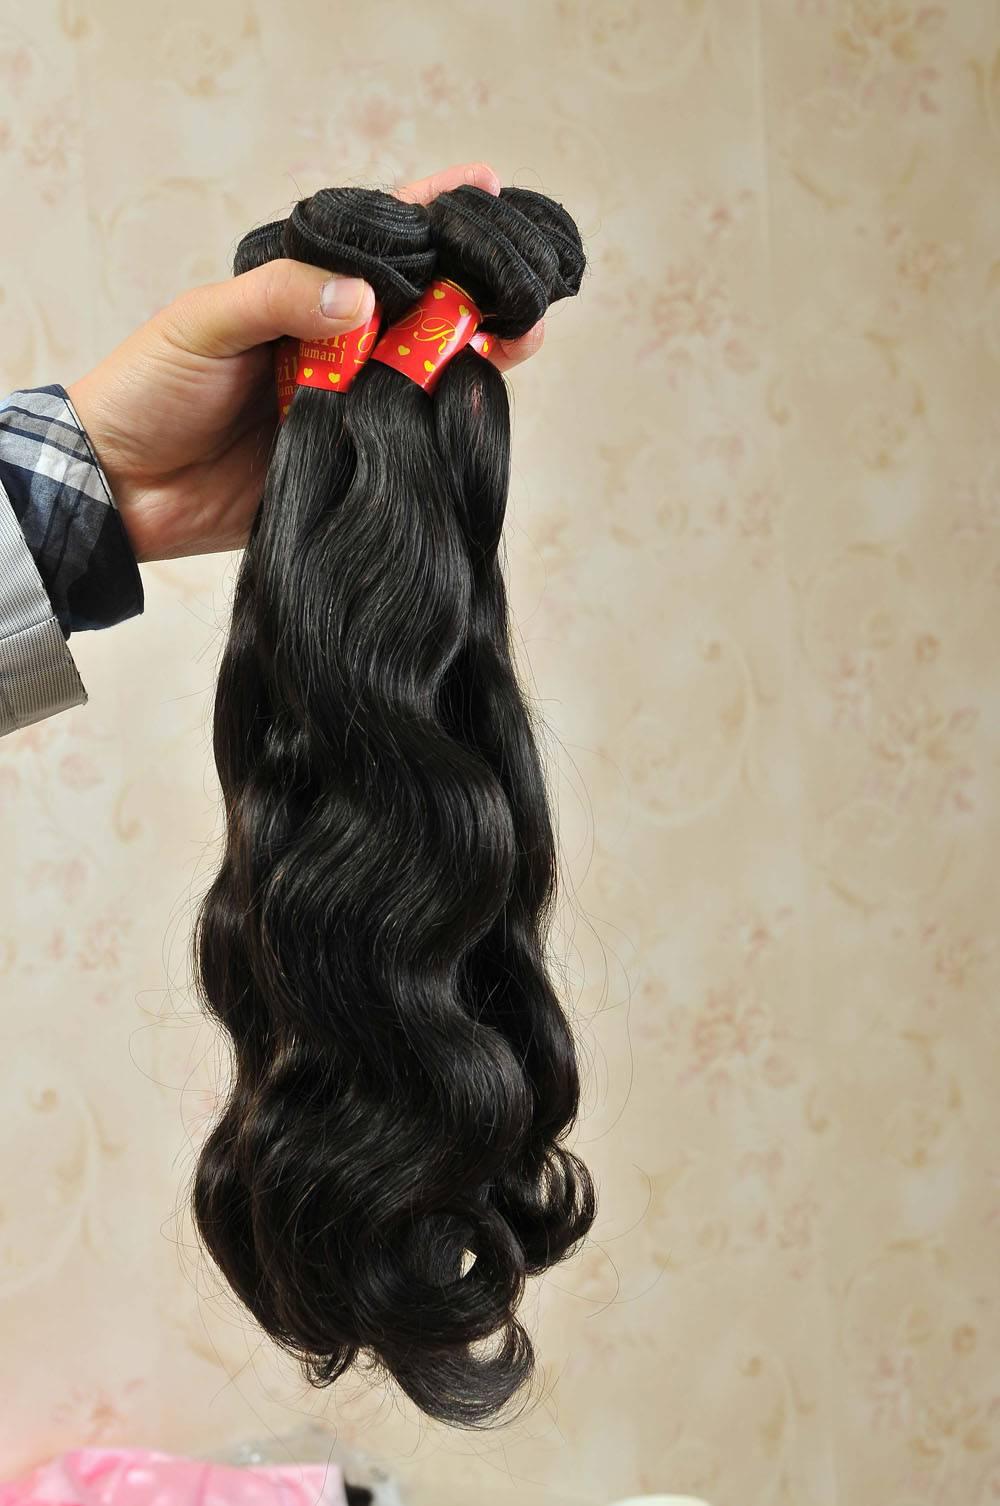 Virgin Human Hair Malaysian Virgin Human Hair Body Wave Human Hair Extensions